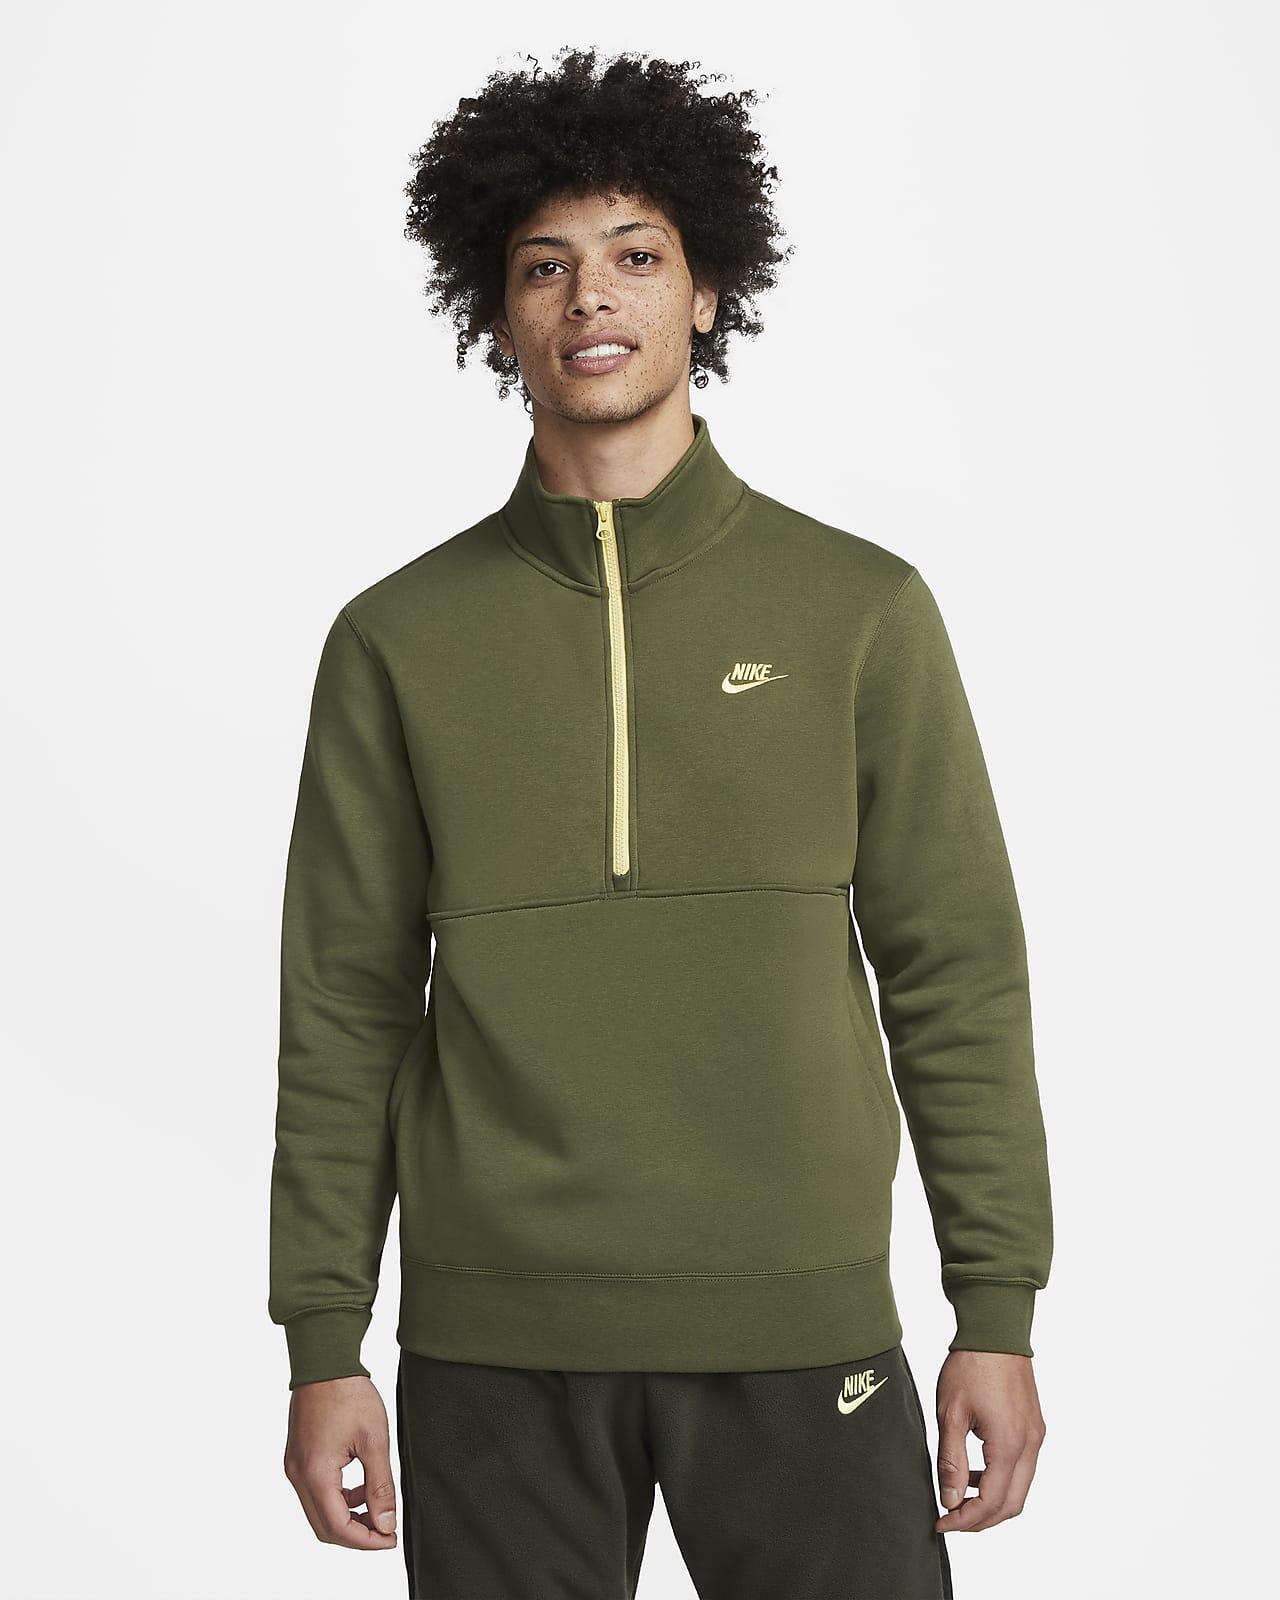 Мужской свитшот с начесом и молнией на половину длины Nike Sportswear Club